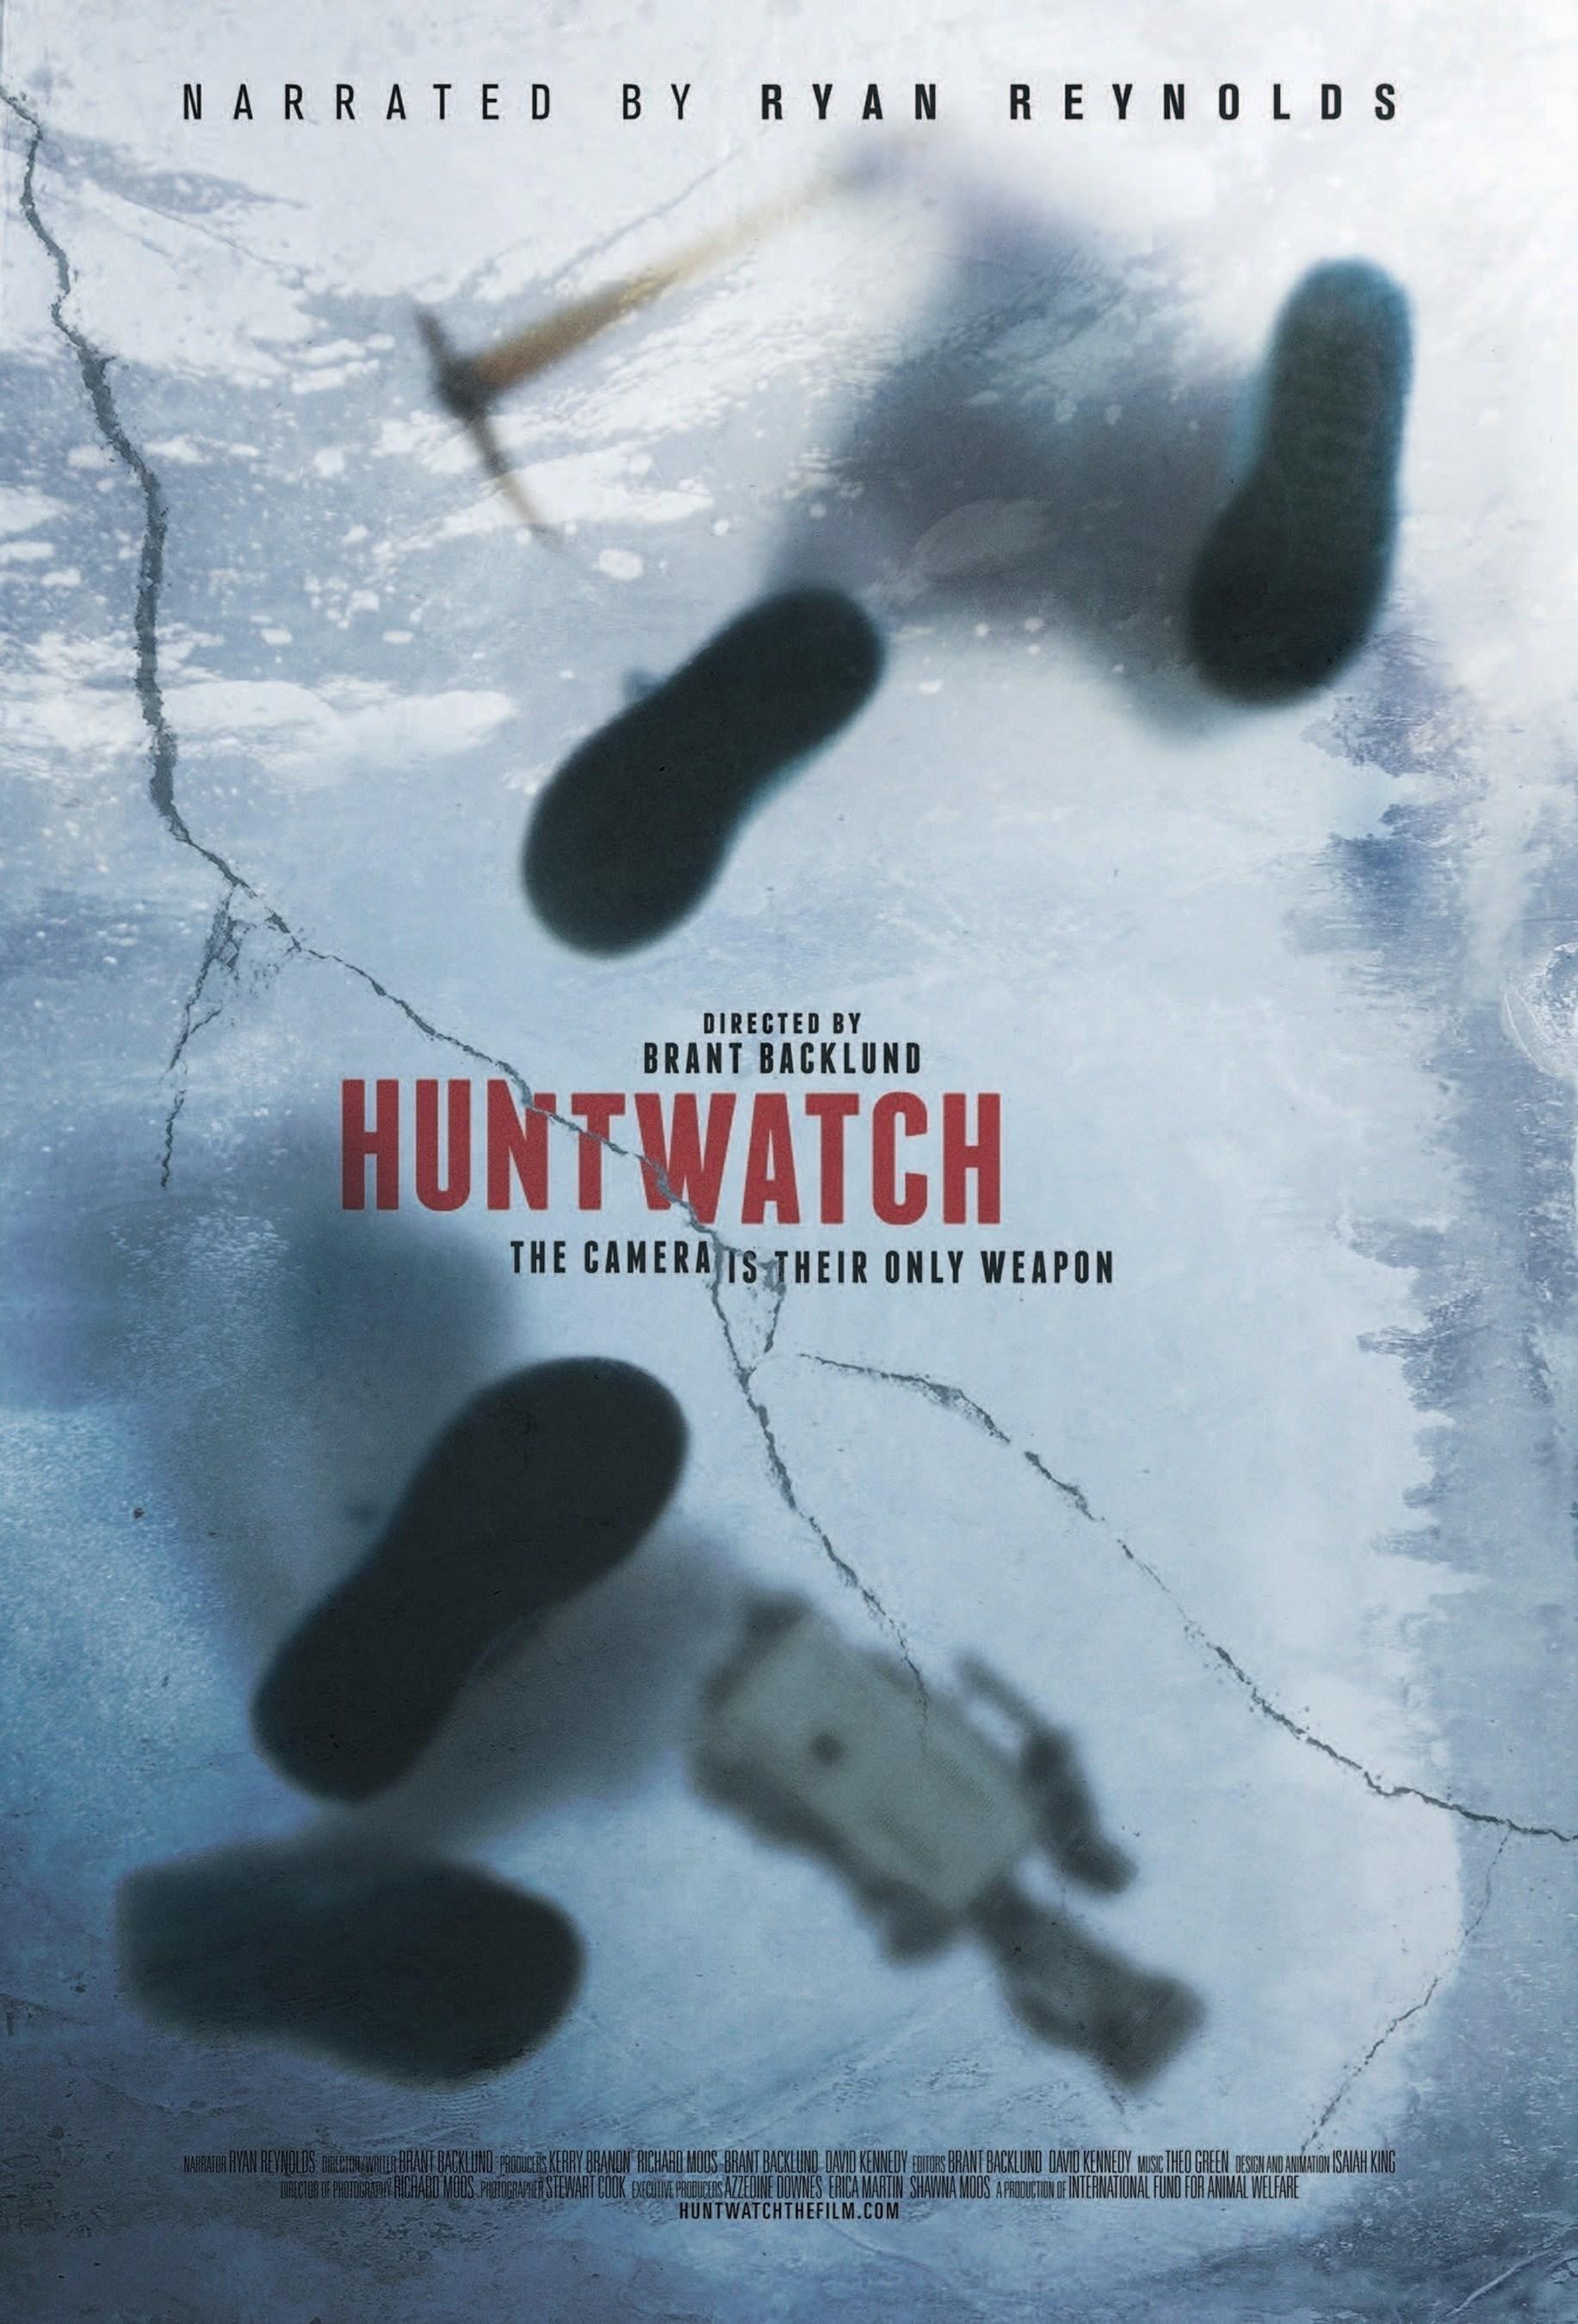 Ryan Reynolds narrates wildlife documentary 'Huntwatch' premiering at DOC NYC